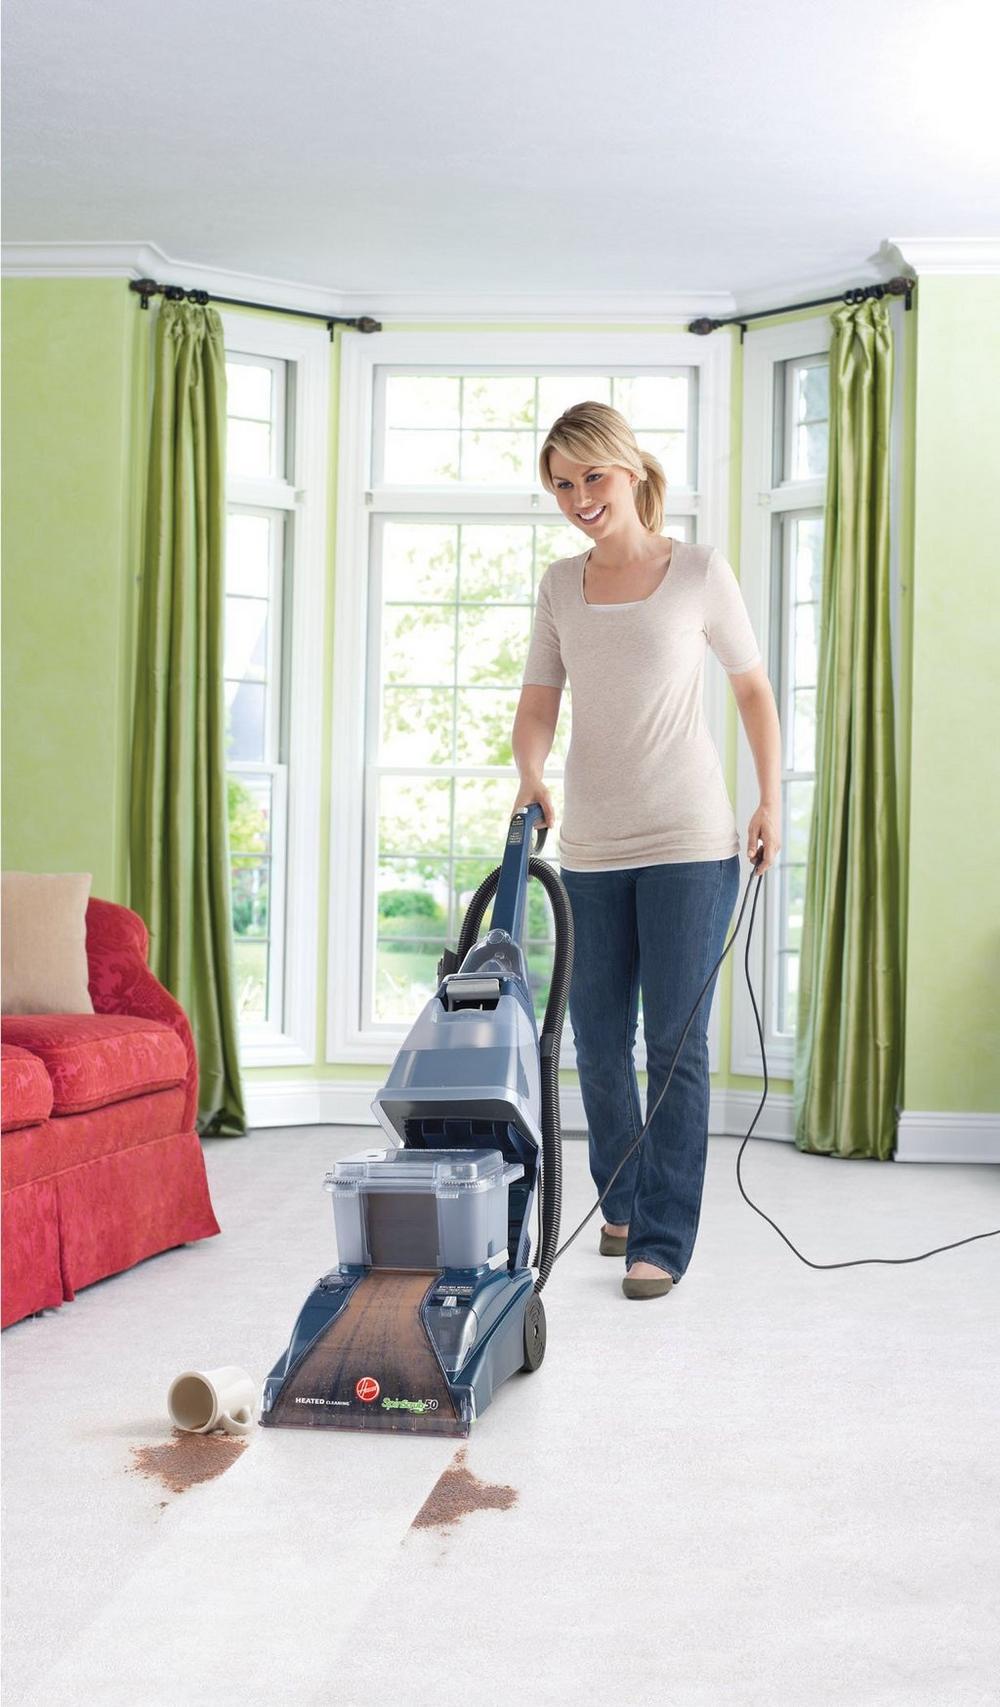 SteamVac SpinScrub with CleanSurge Carpet Cleaner3